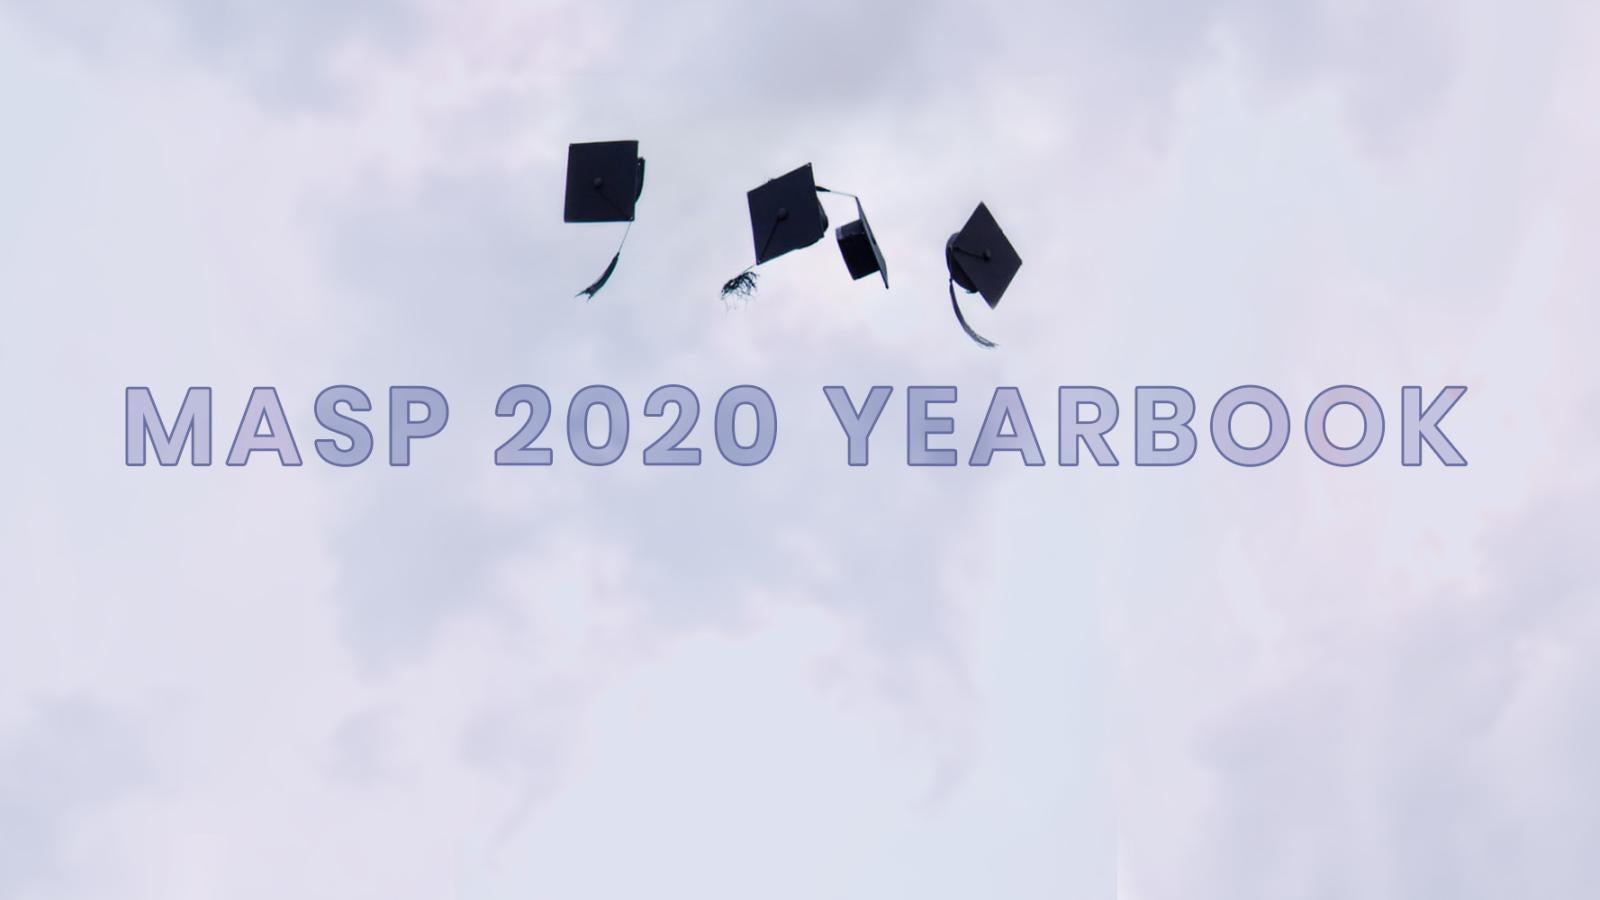 MASP 2020 Yearbook